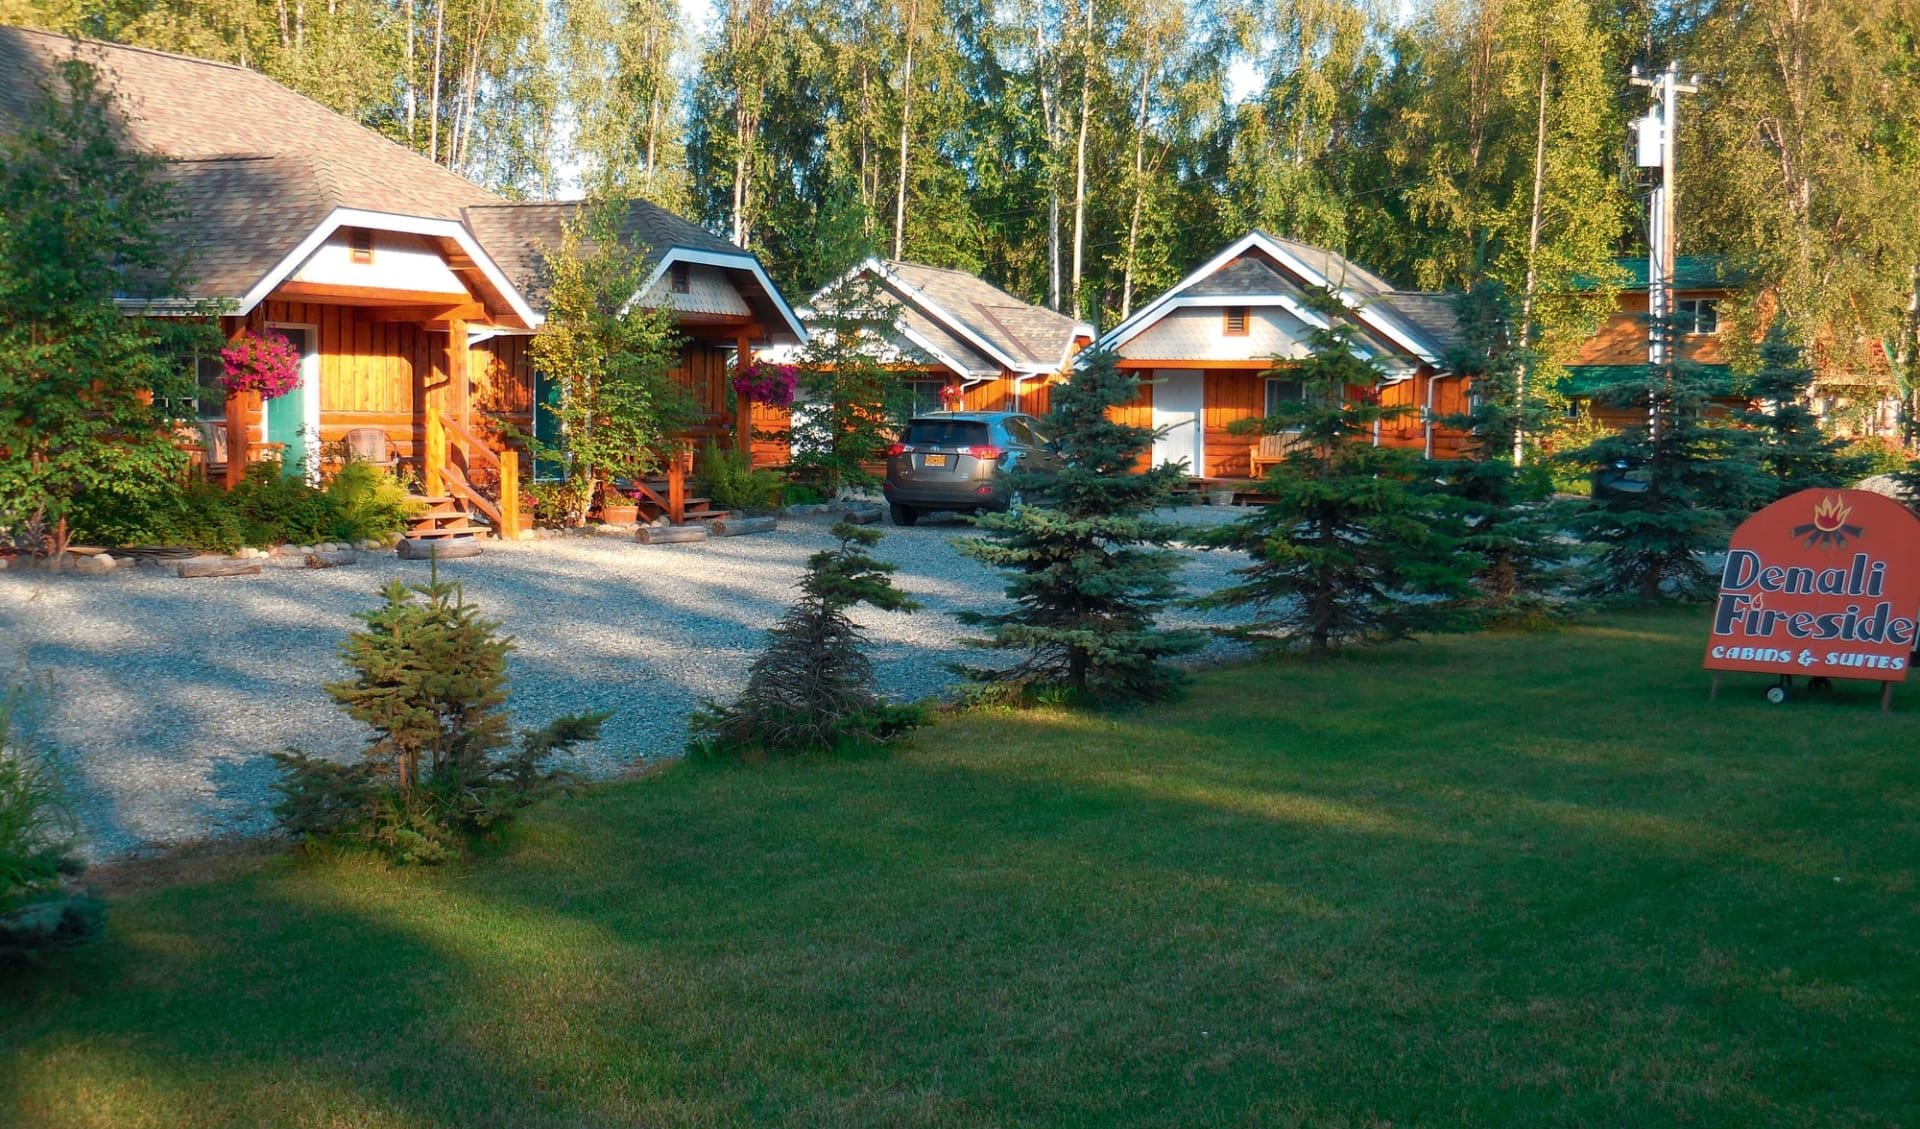 Denali Fireside Cabin and Suites in Talkeetna: _Denali Fireside Cabins und Suites - Aussenansicht